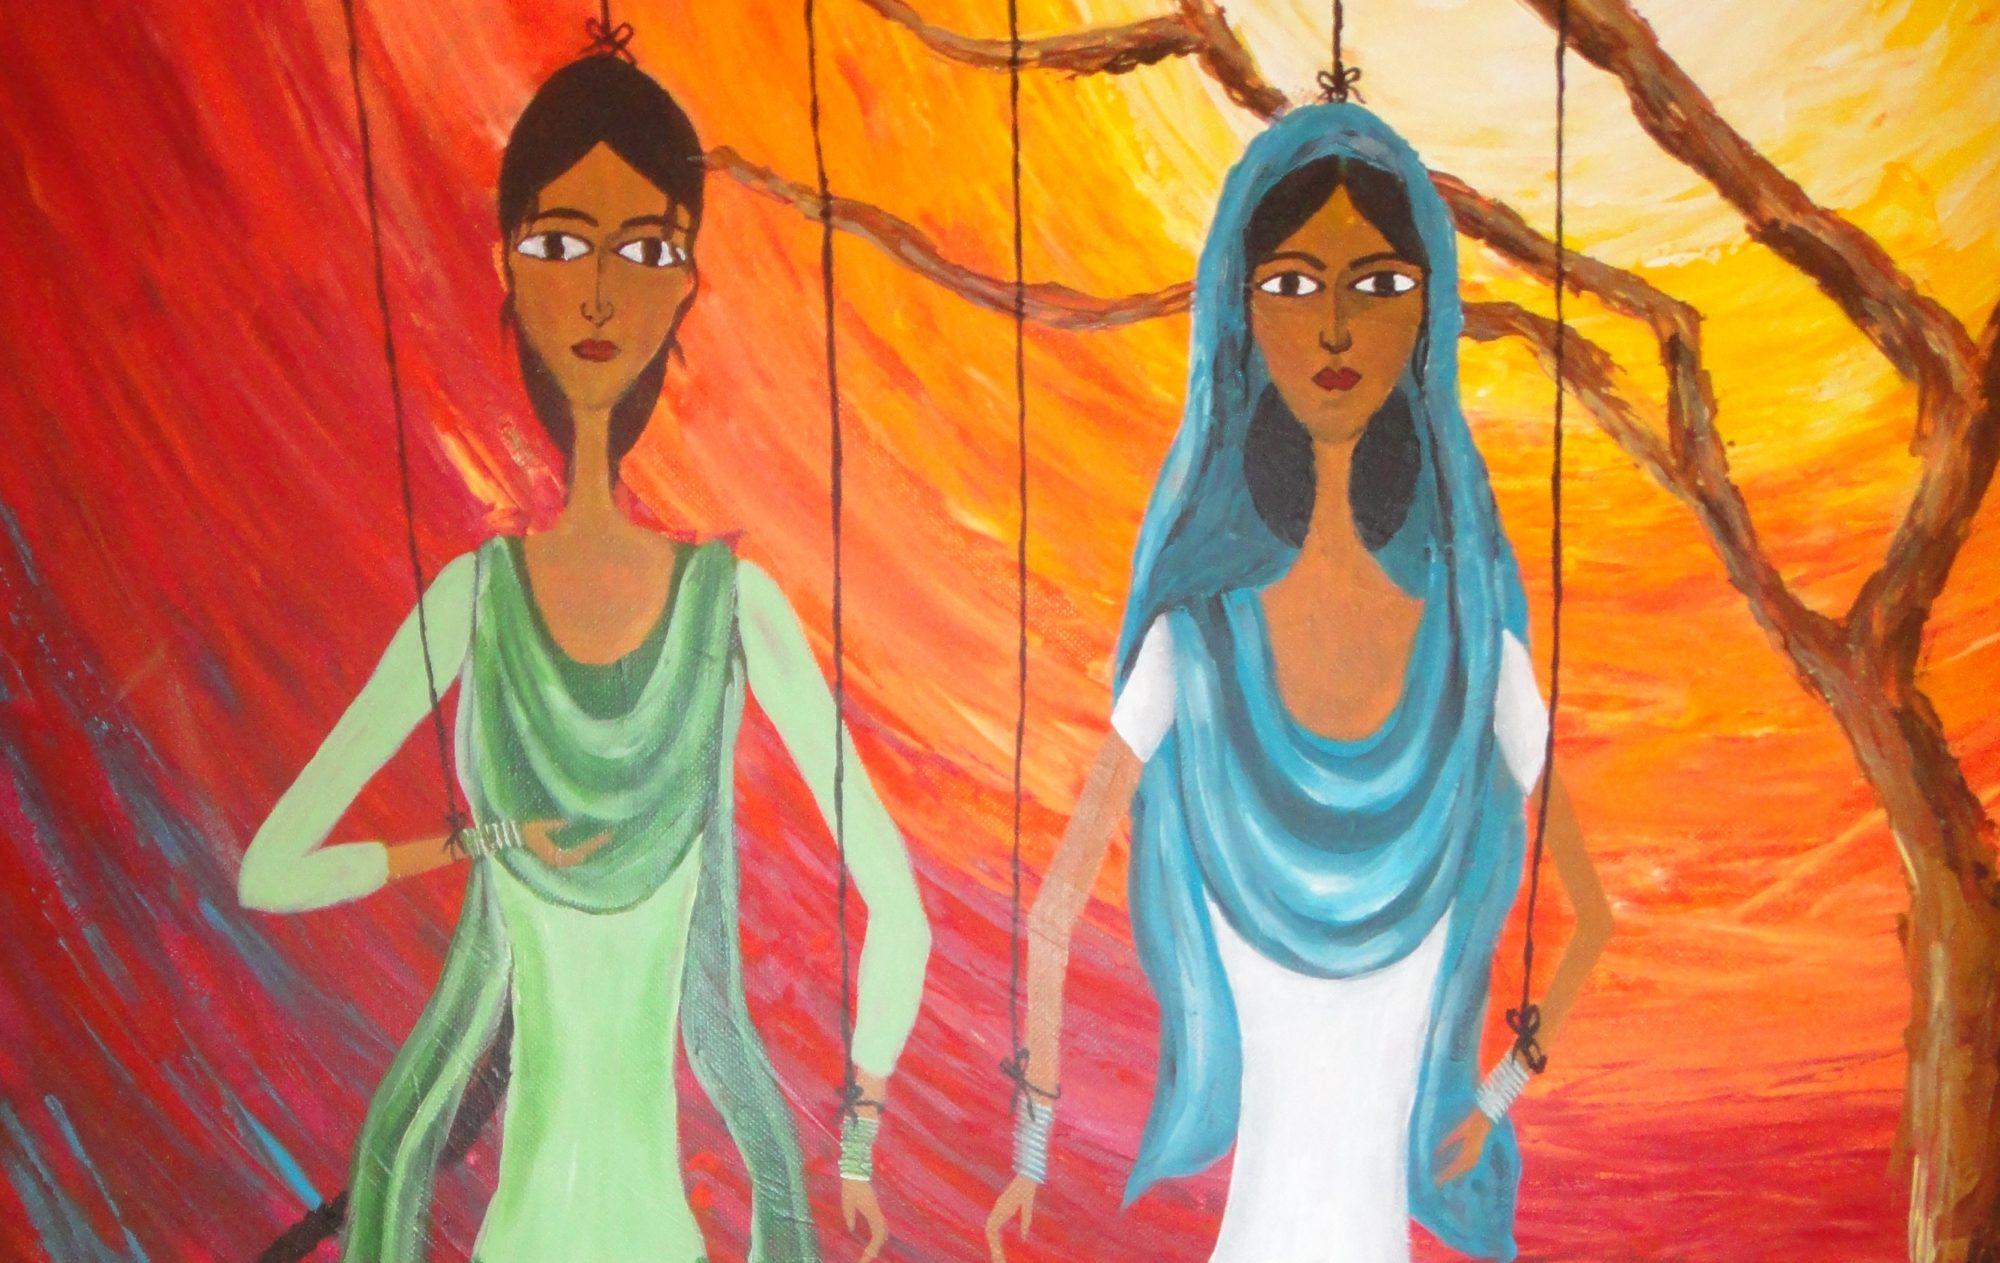 The Feminist Kaur with a Paintbrush